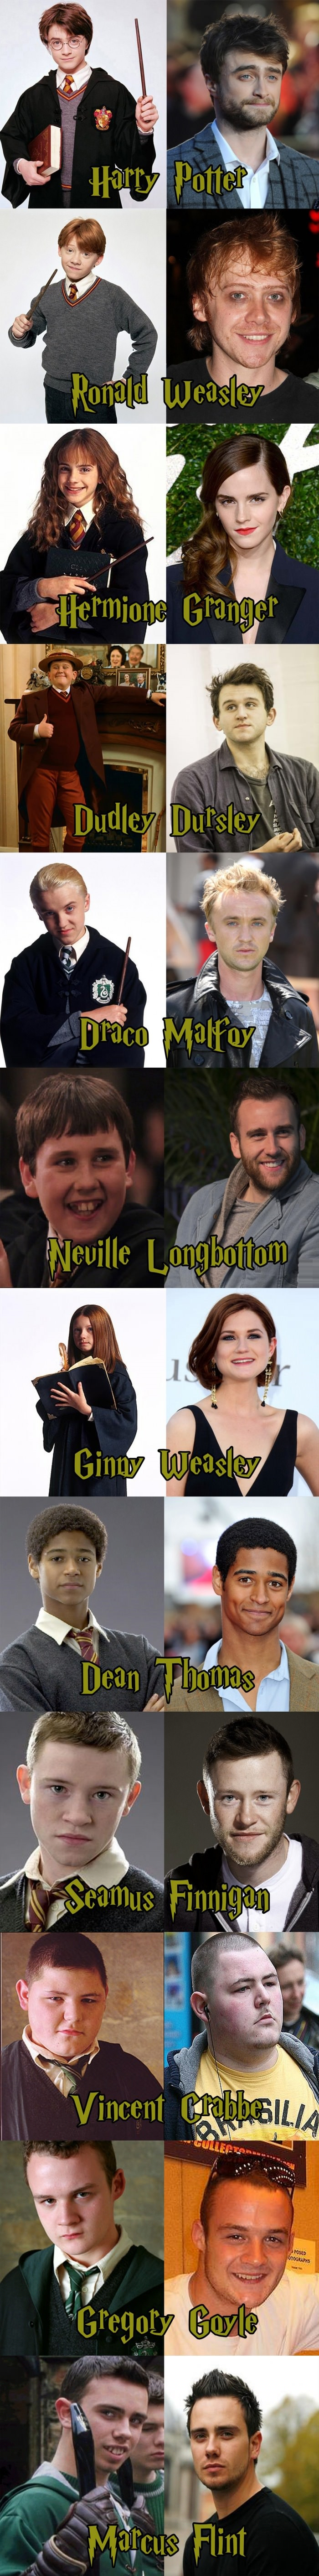 Harry Potter Evolution - part 1